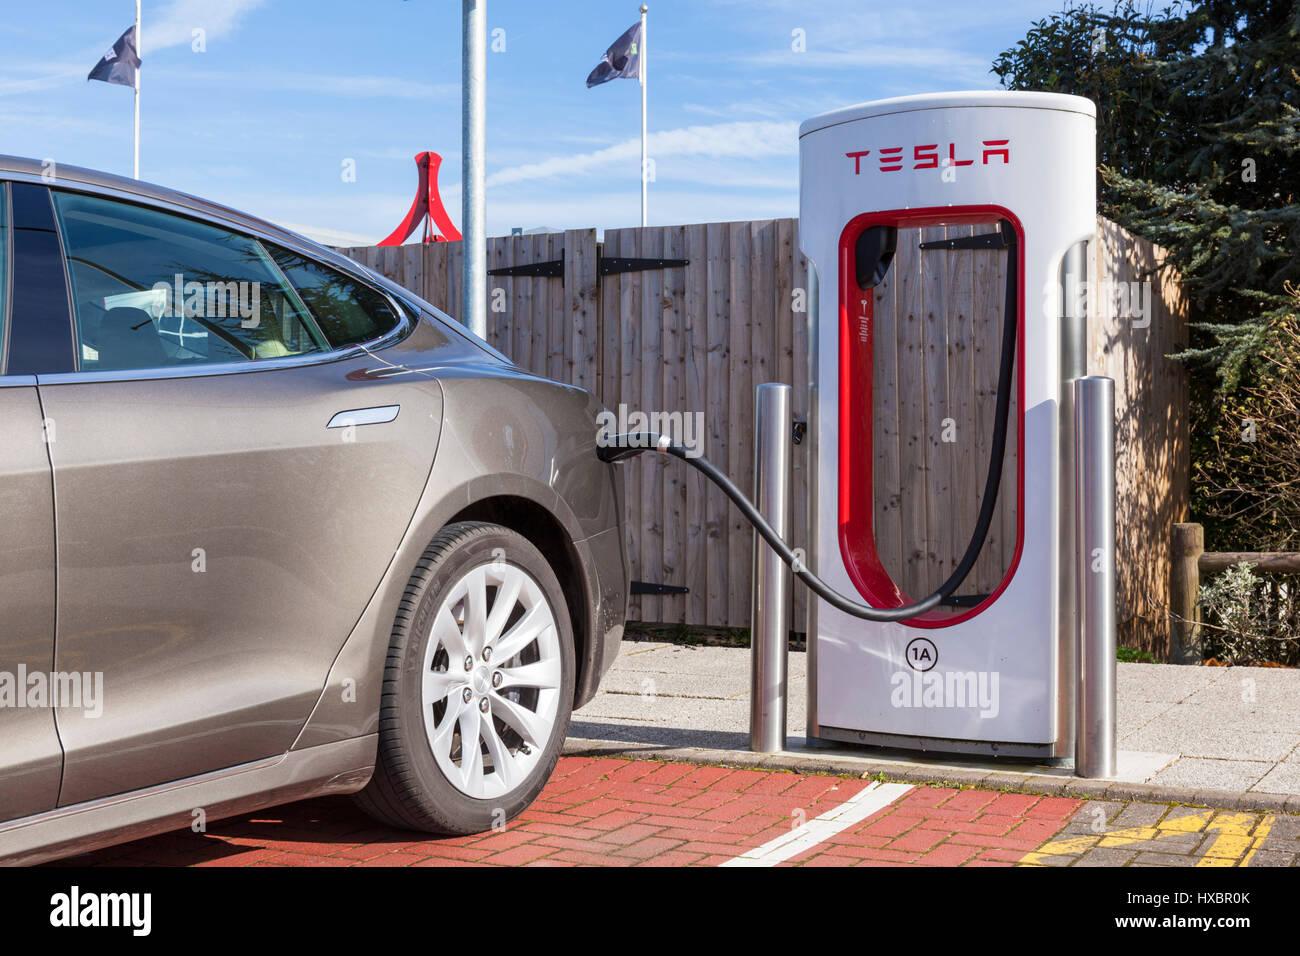 tesla car tesla charging tesla model s charging tesla supercharging tesla supercharger - Stock Image